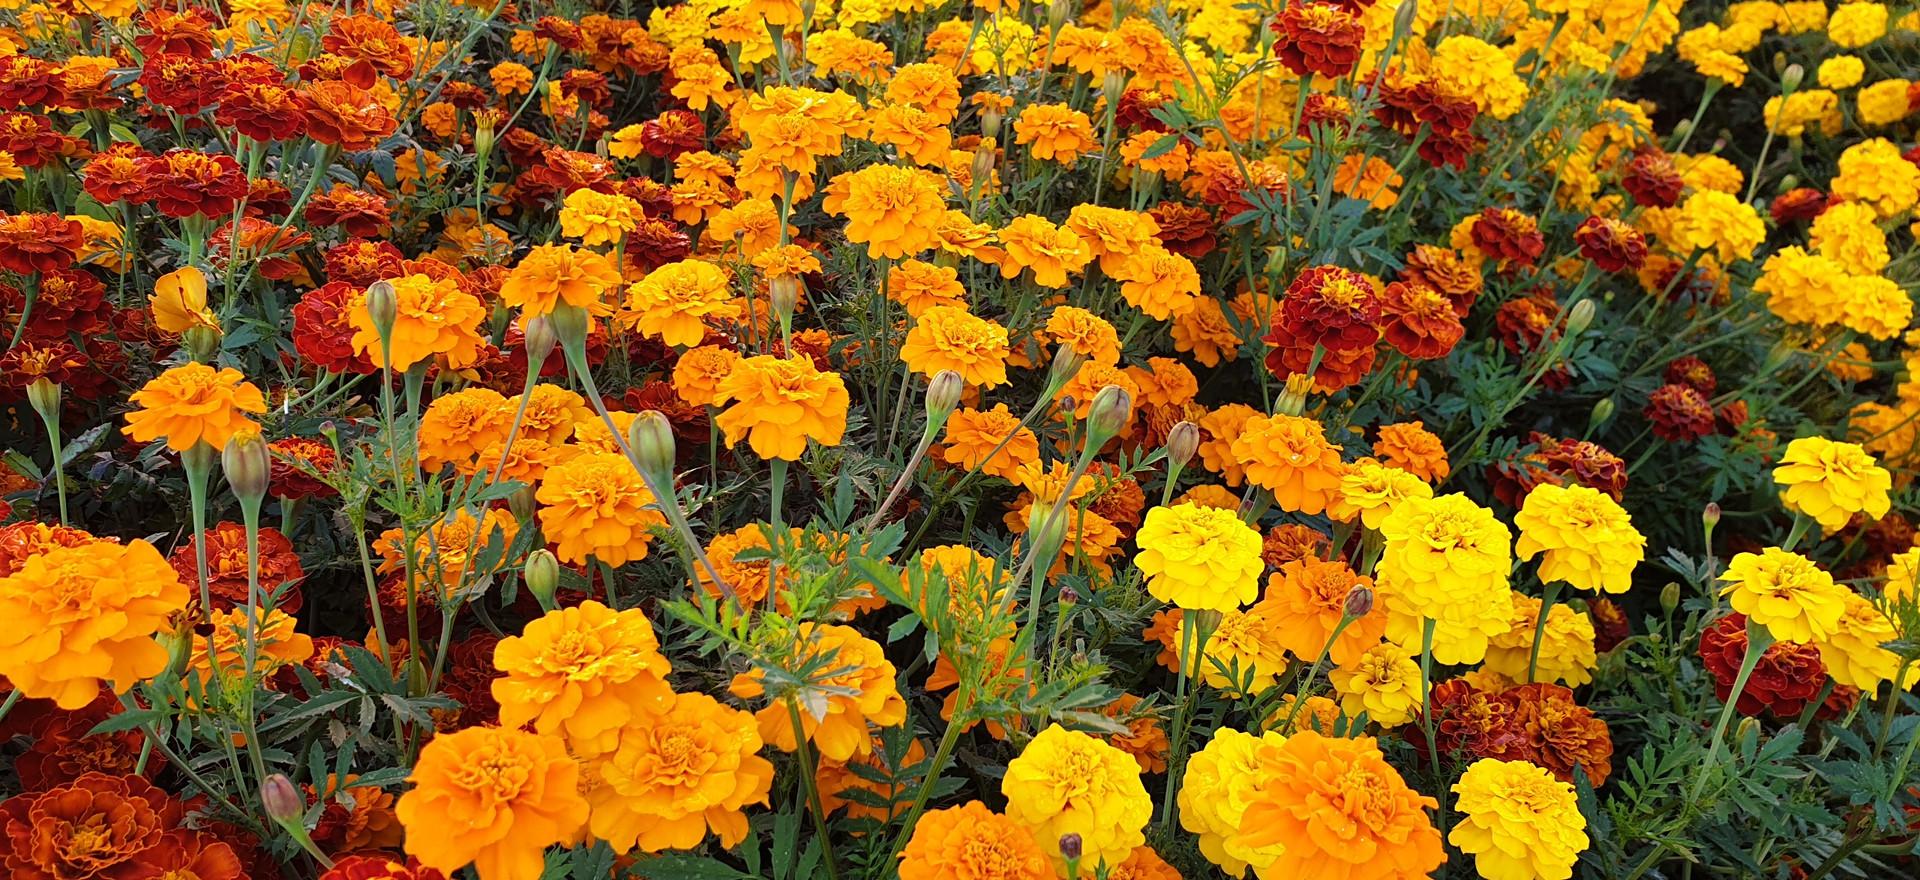 TEMPLE GARDEN FLOWERS